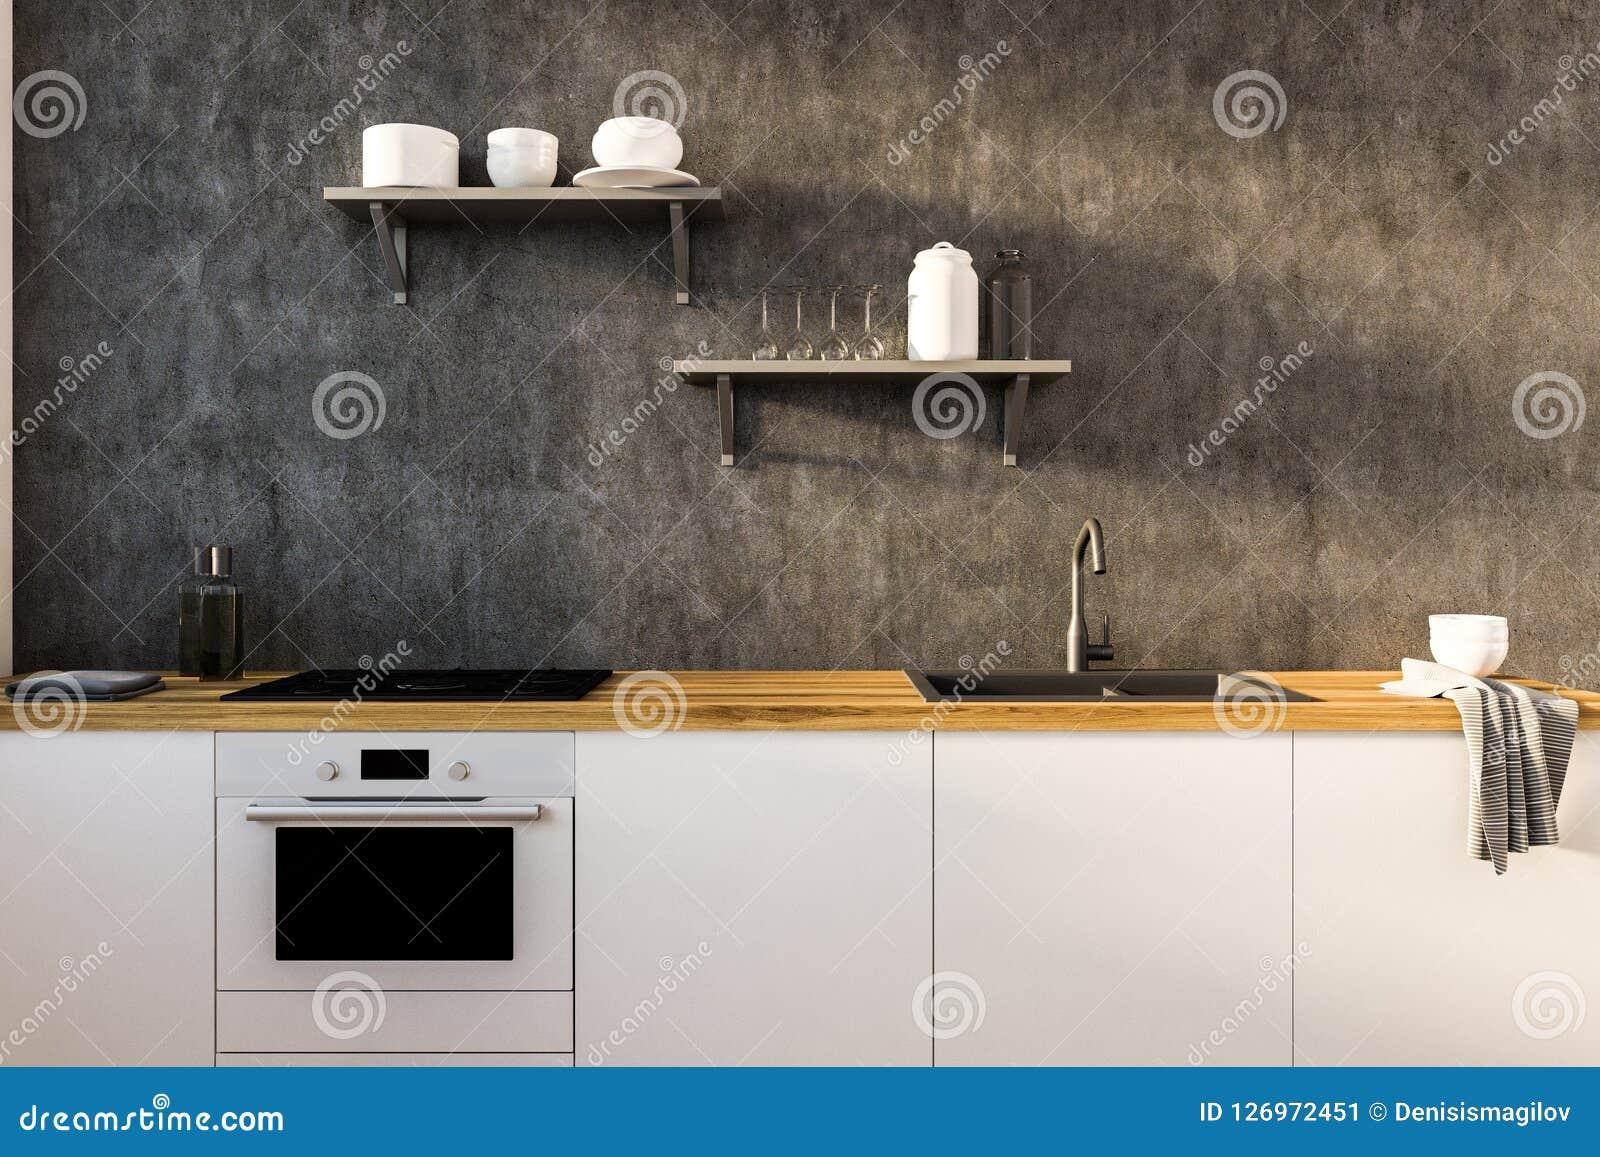 Concrete Kitchen Wall And White Countertops Stock ...